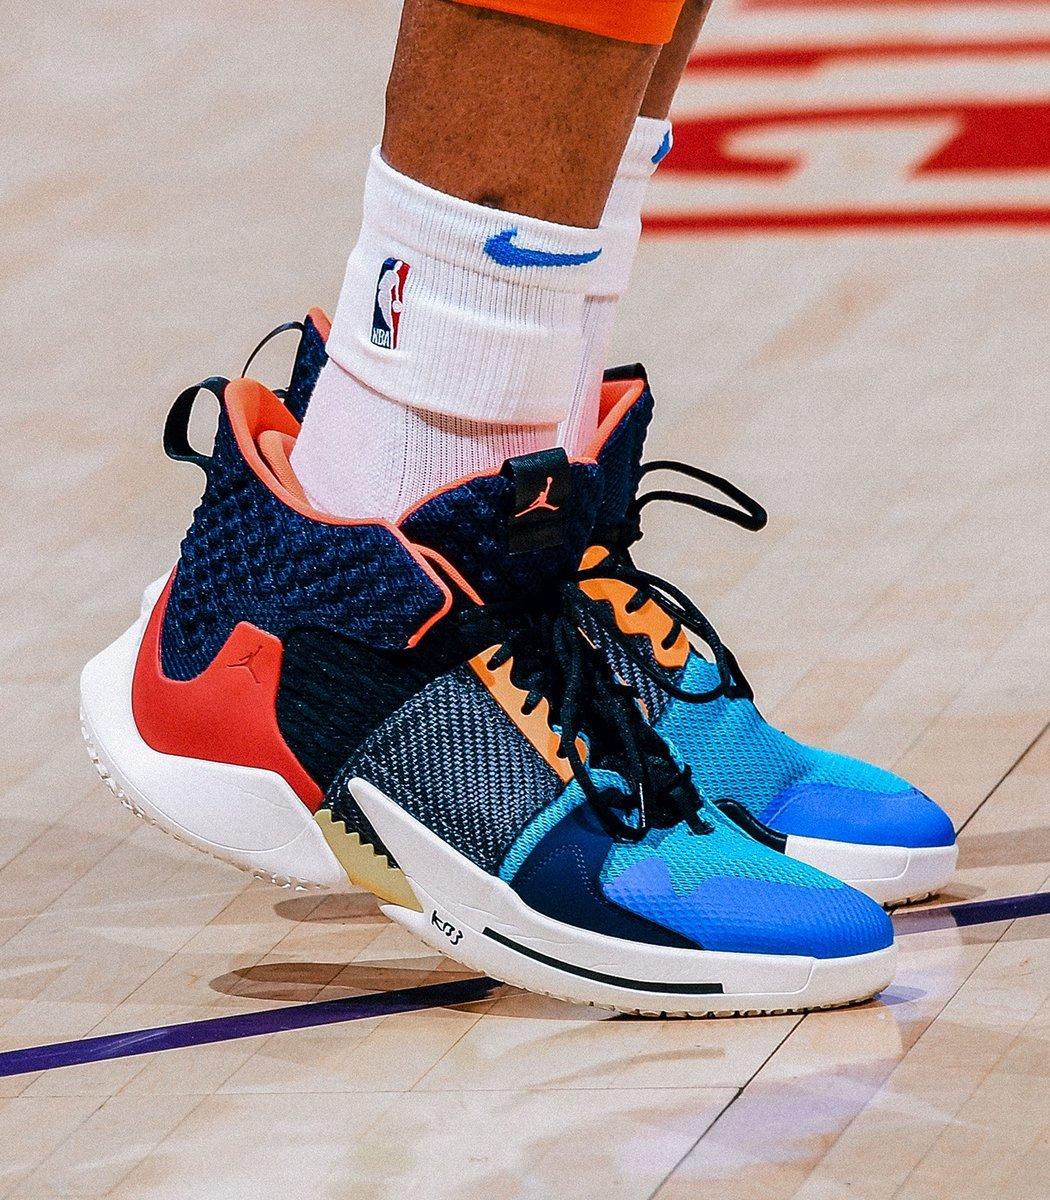 Air Jordan Why Not Zer0.2 Shoes